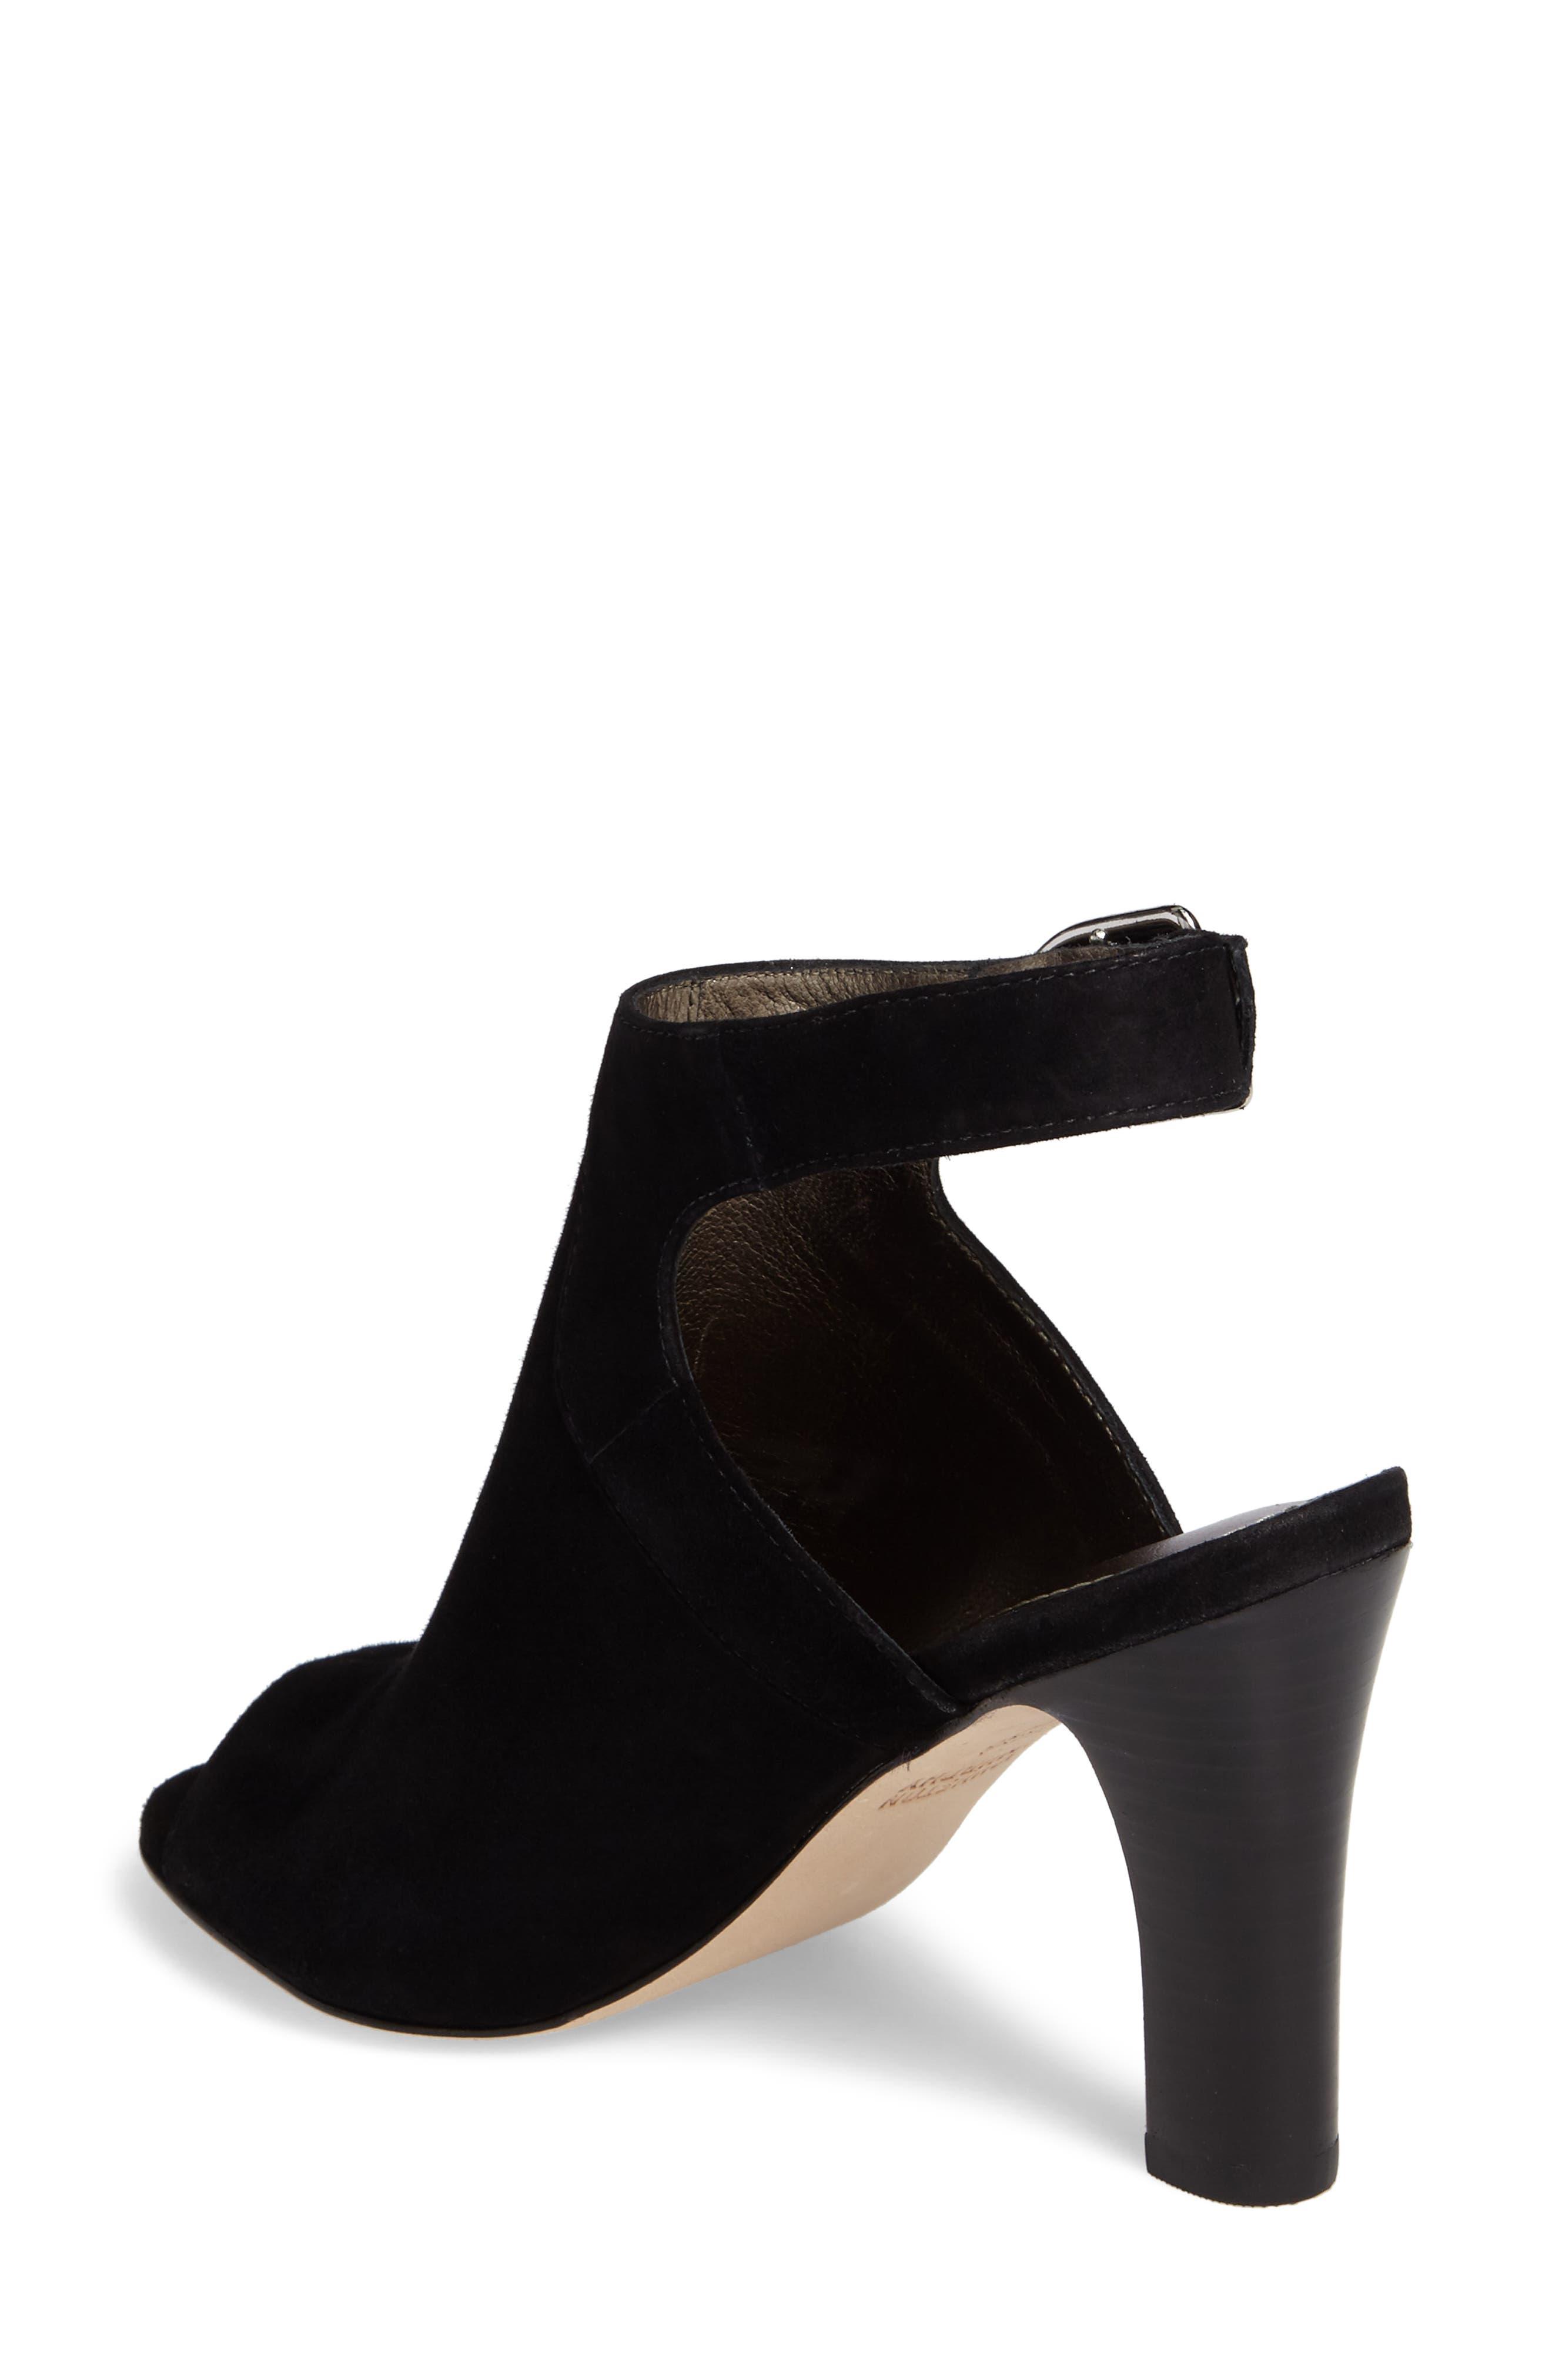 Cassie Peep Toe Sandal,                             Alternate thumbnail 2, color,                             BLACK LEATHER